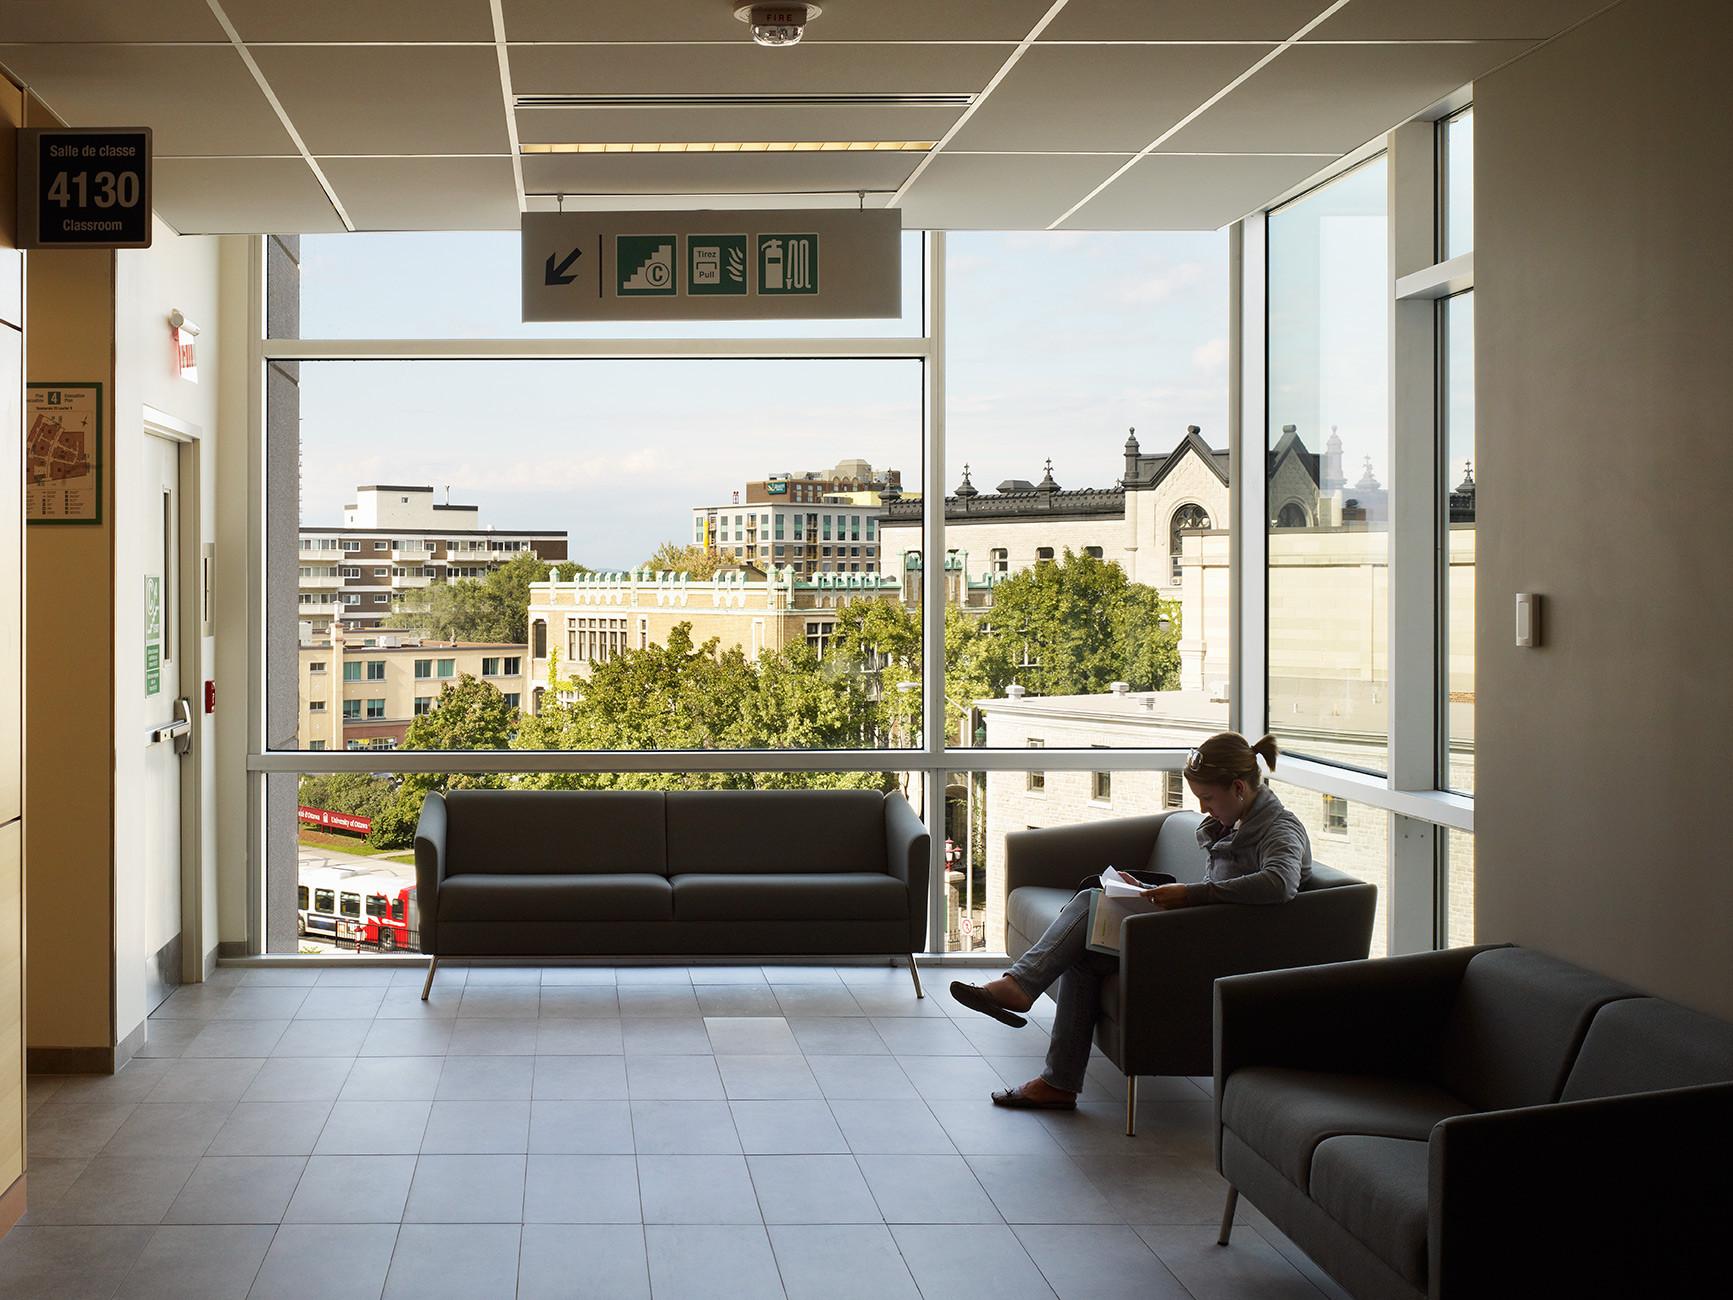 Desmarais Building University Of Ottawa